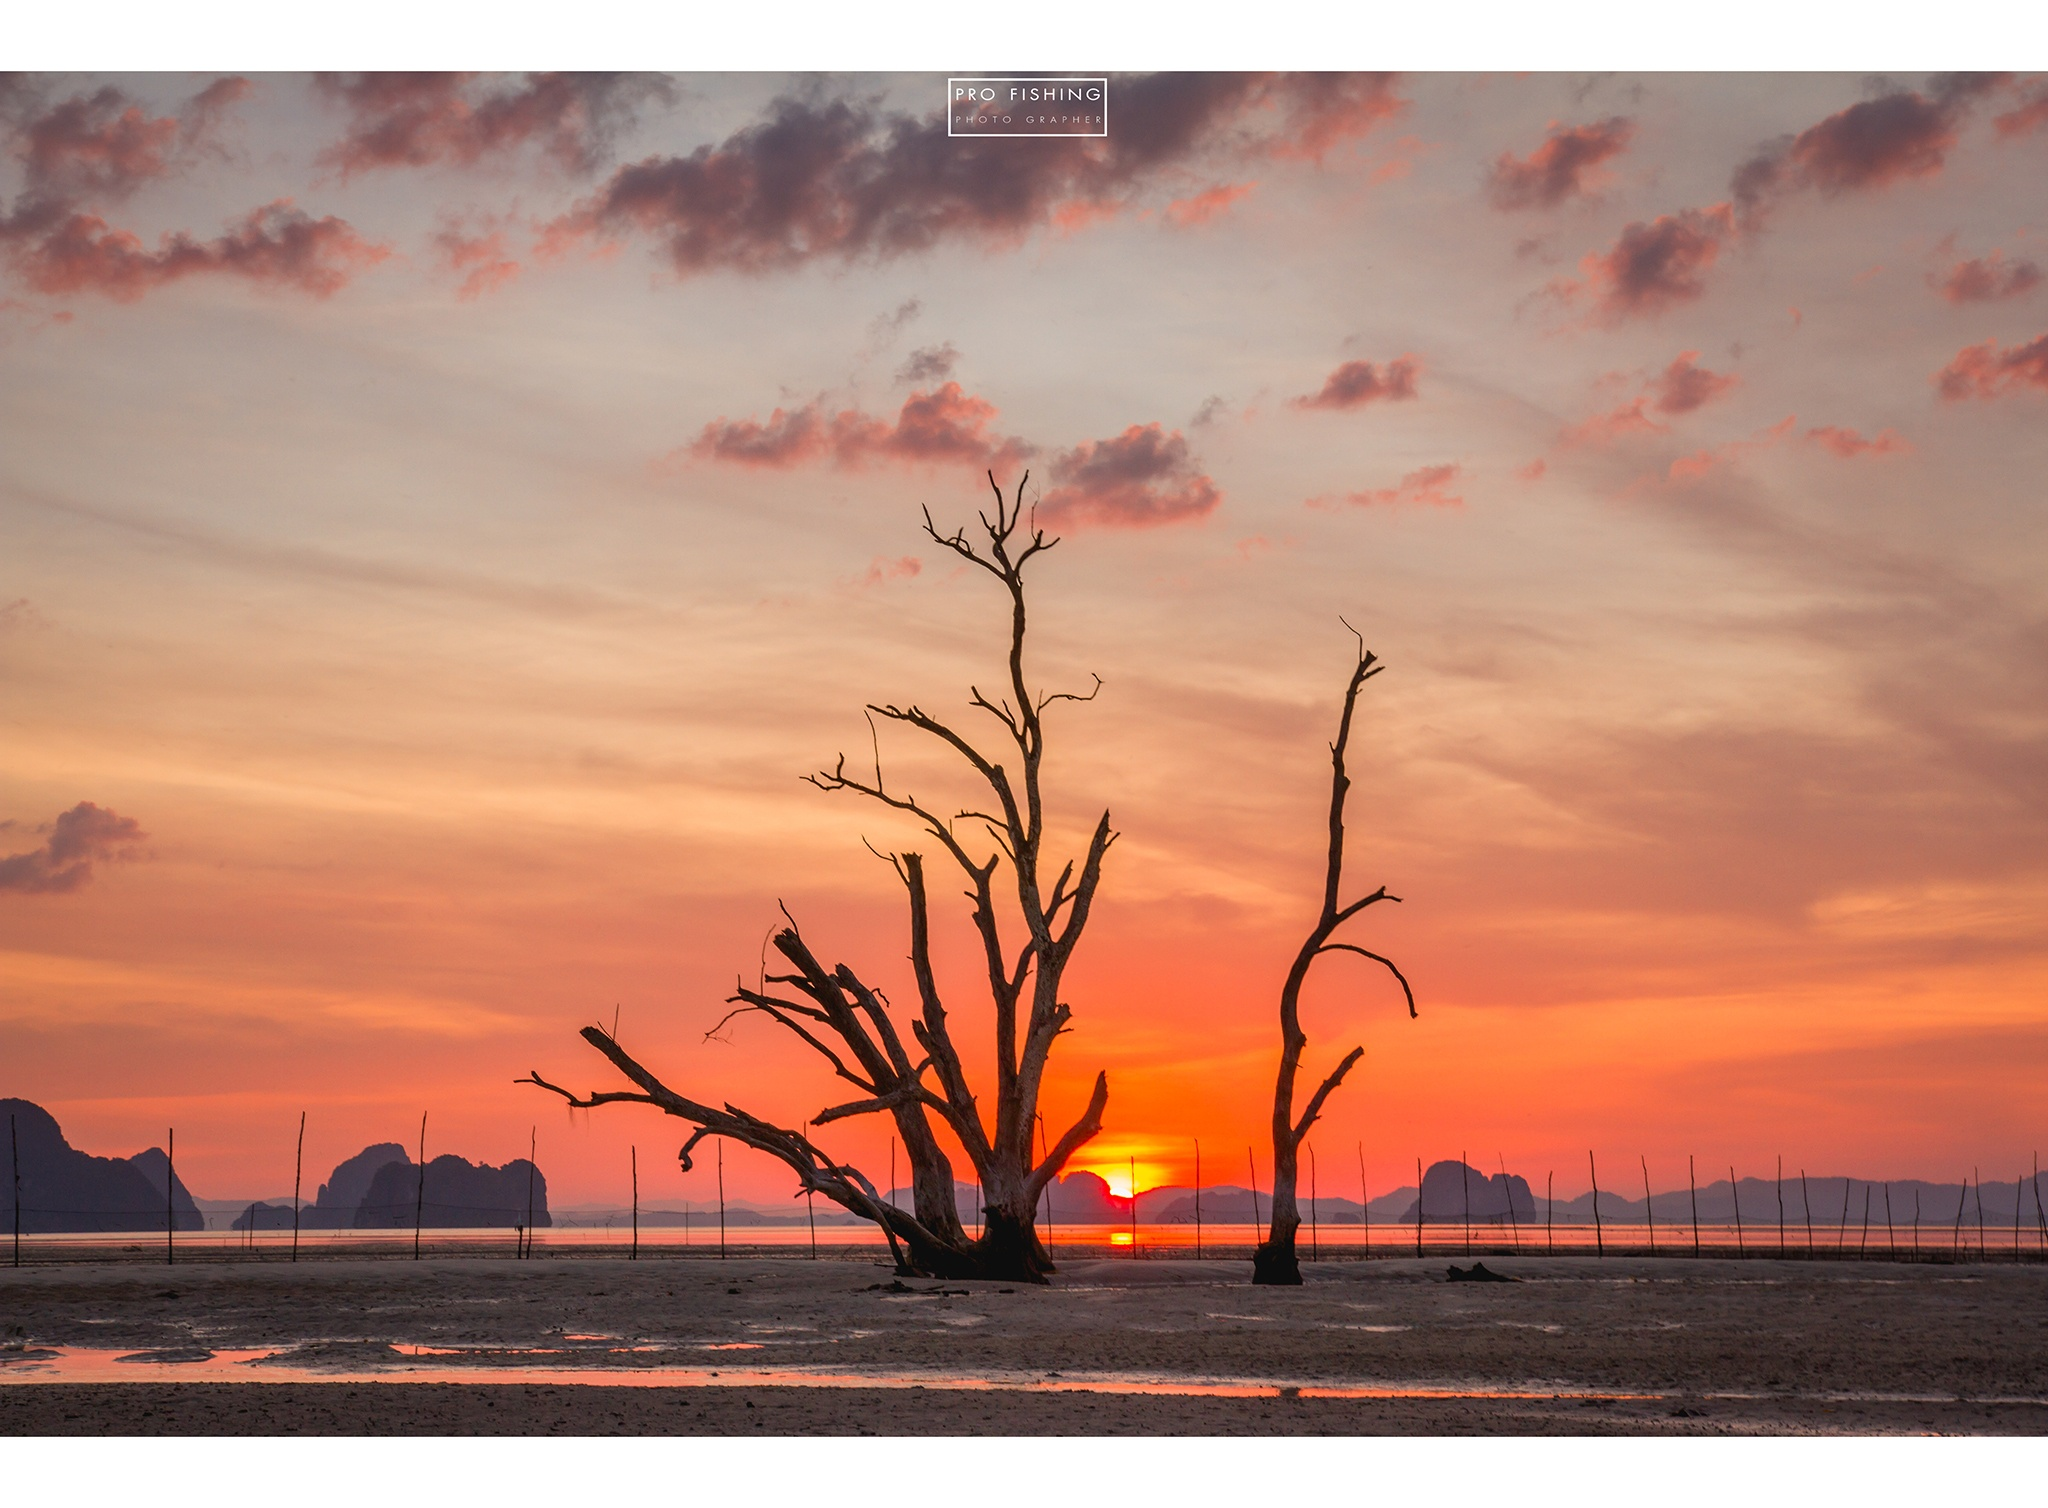 Sunset by Phuketlocalphotographer